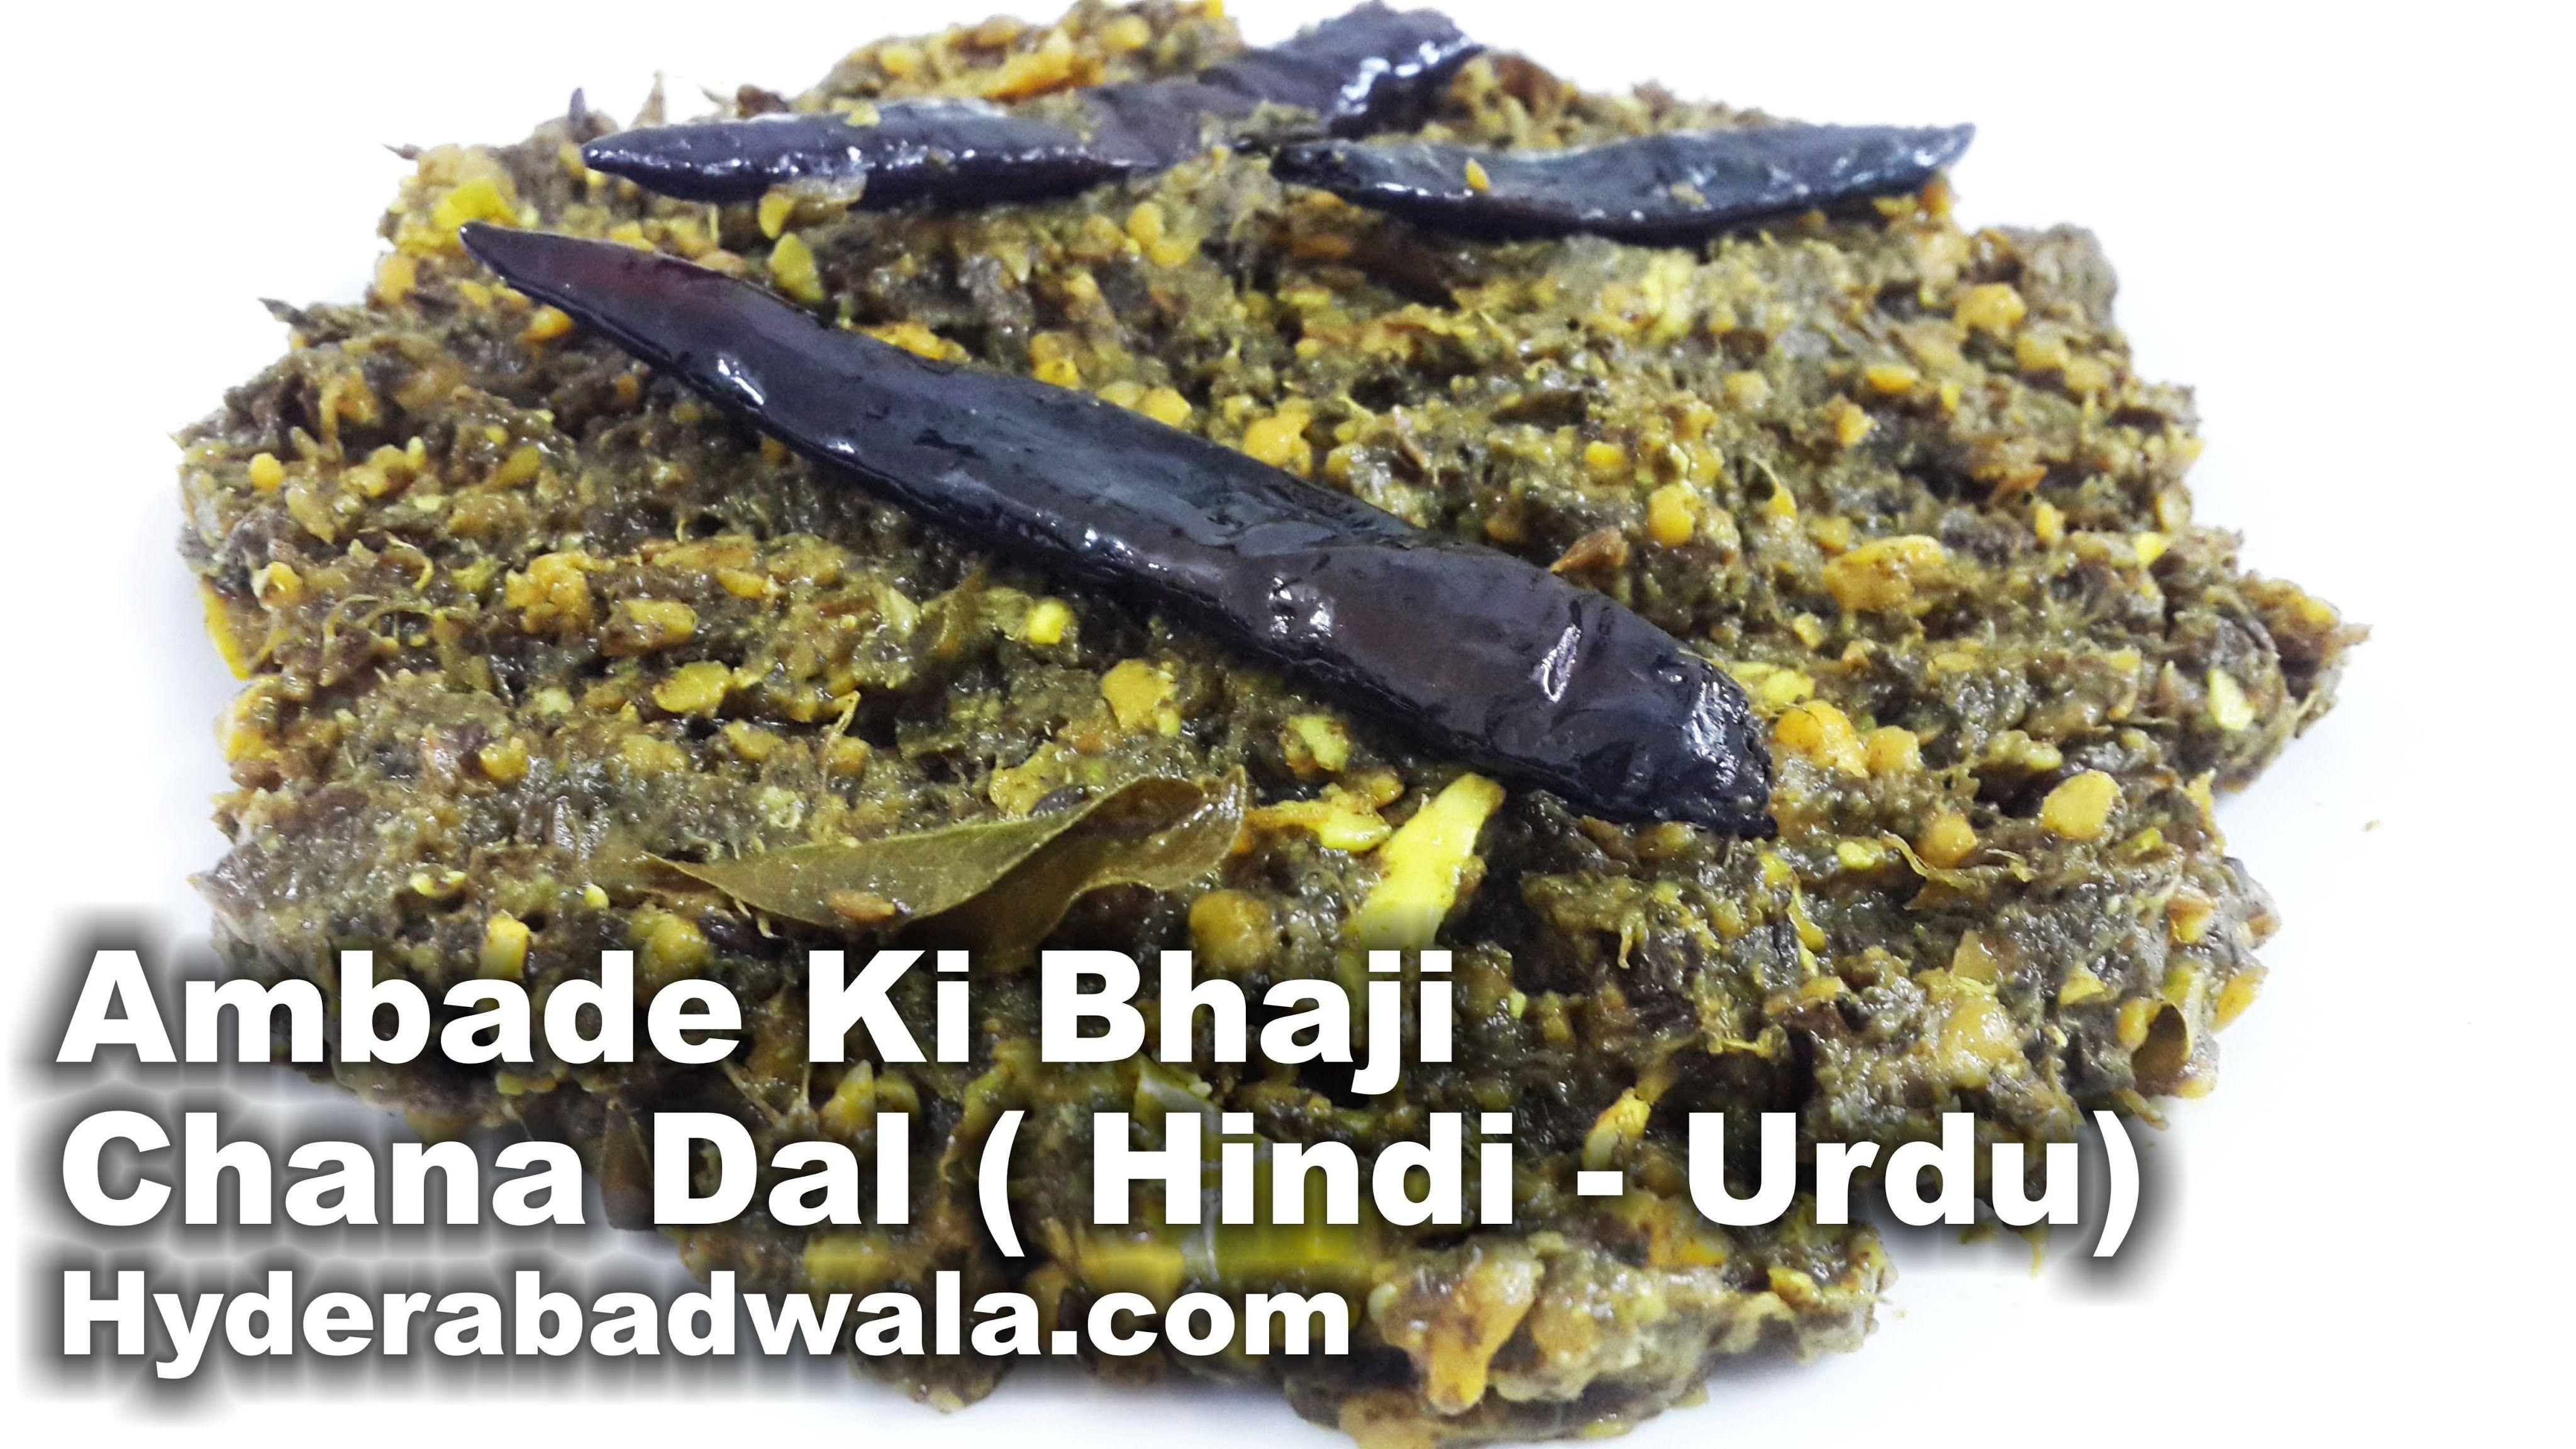 Hyderabadi ambade ki bhaji chana dal recipe video in hindi urdu hyderabadi ambade ki bhaji chana dal recipe video in hindi urdu forumfinder Choice Image